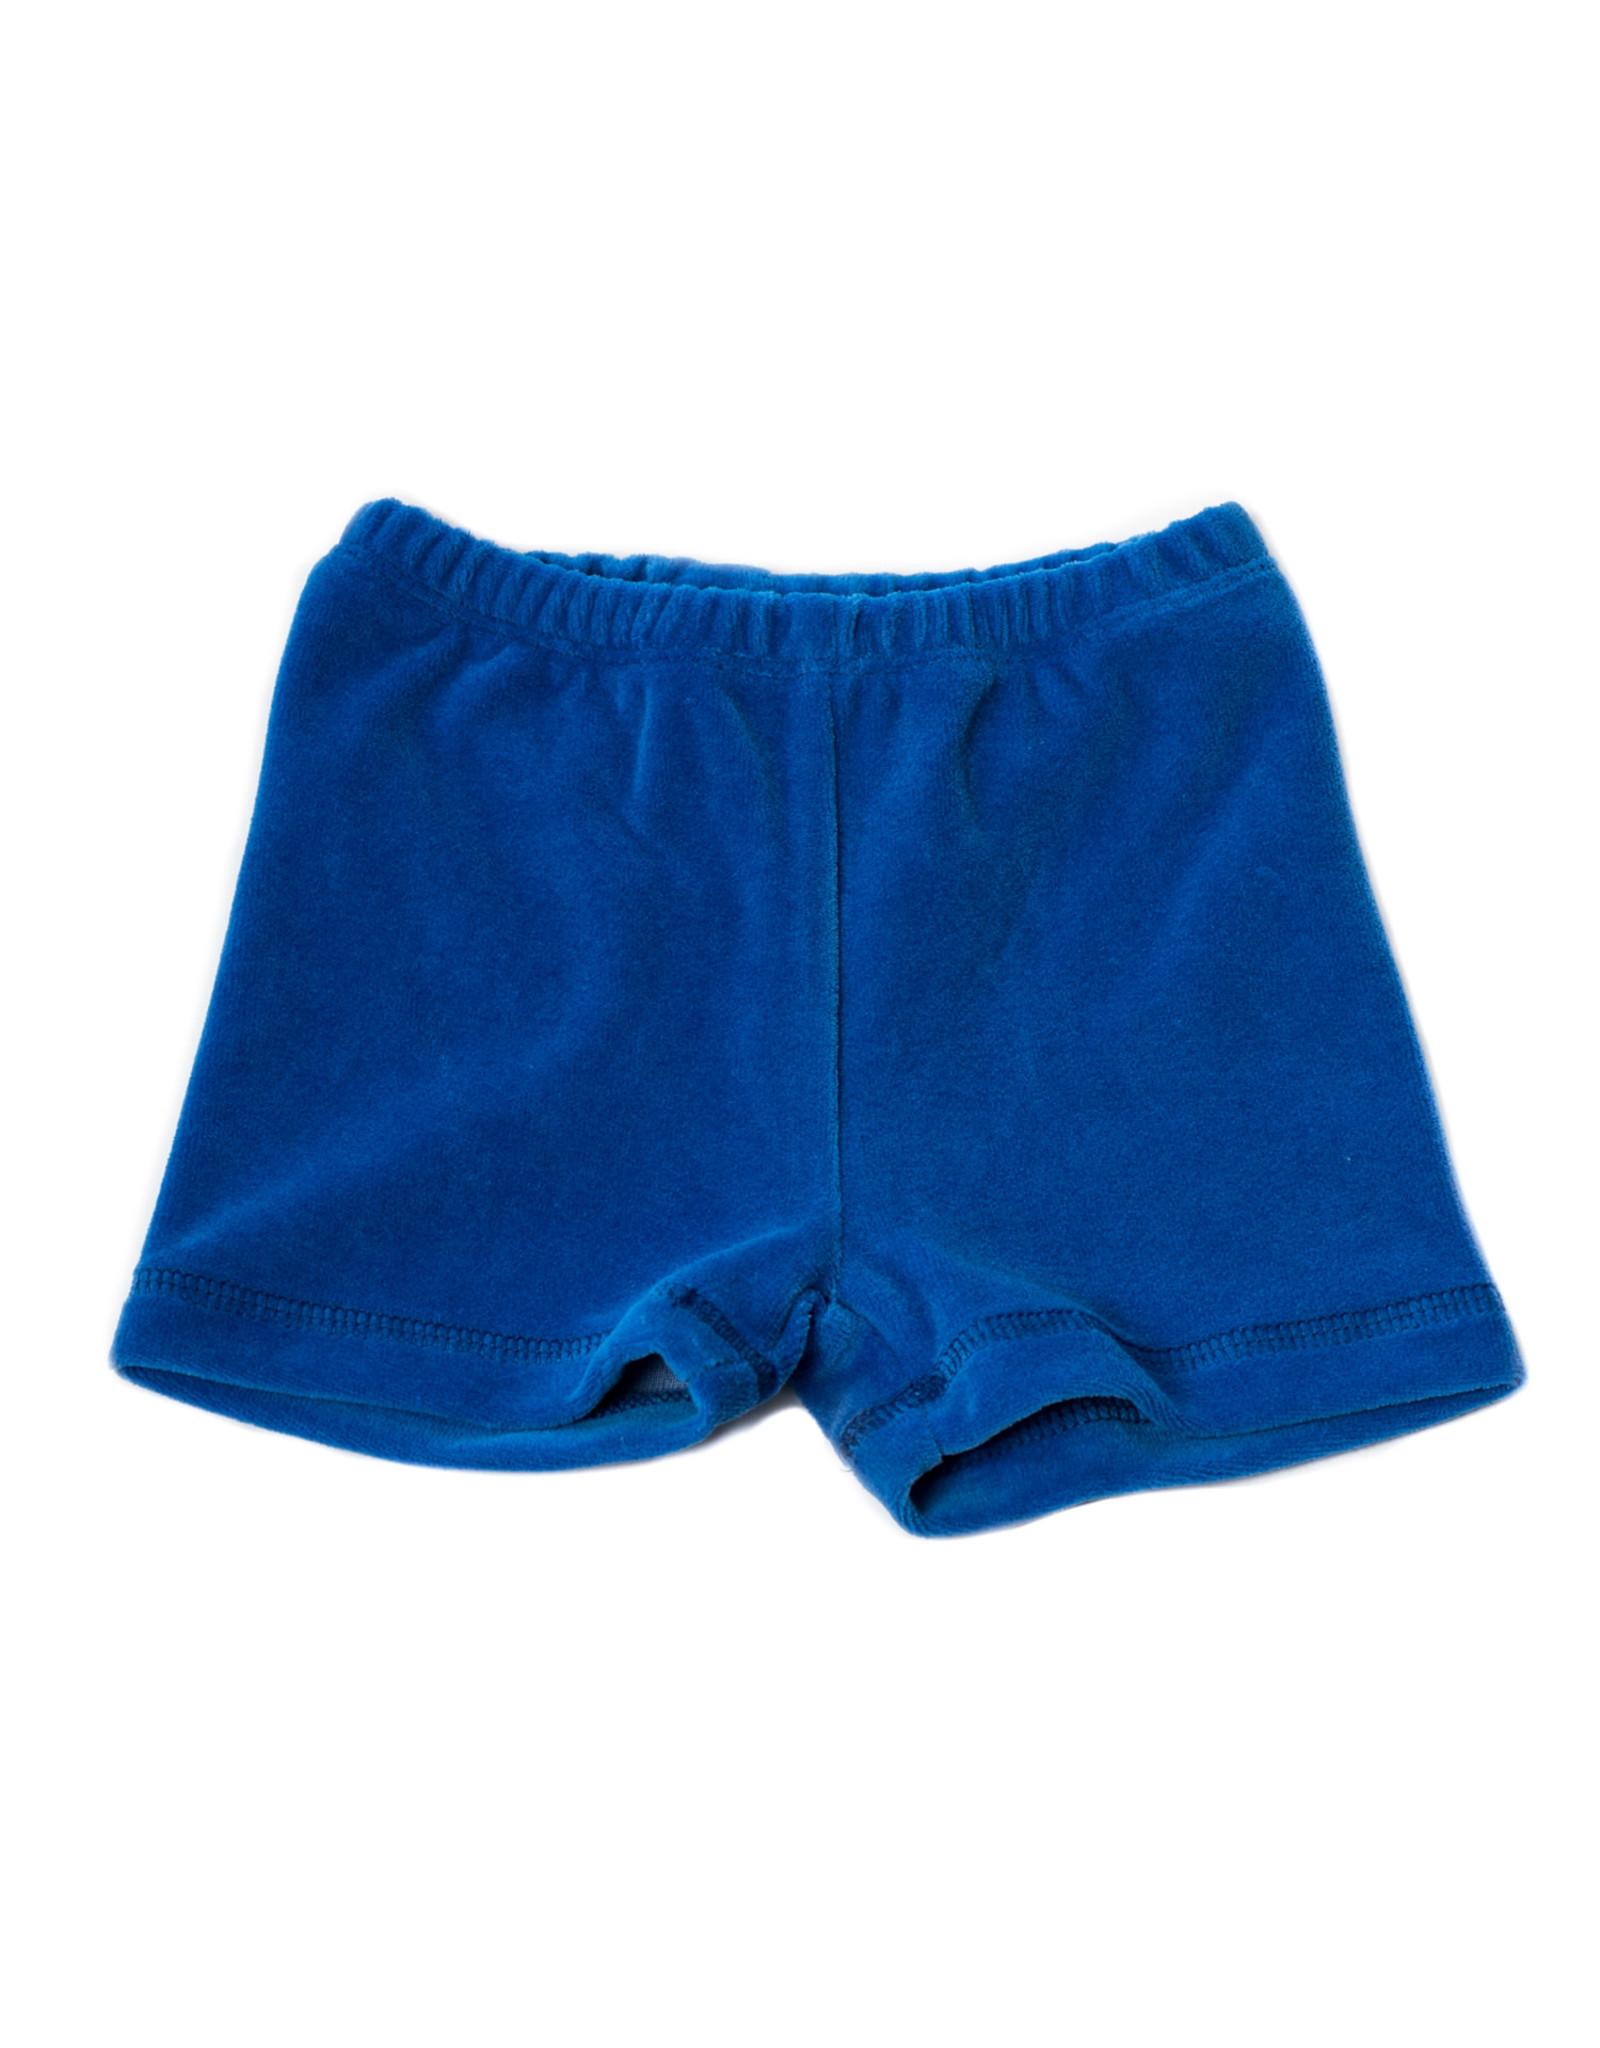 Onnolulu Onnolulu shorts Ben blue velour